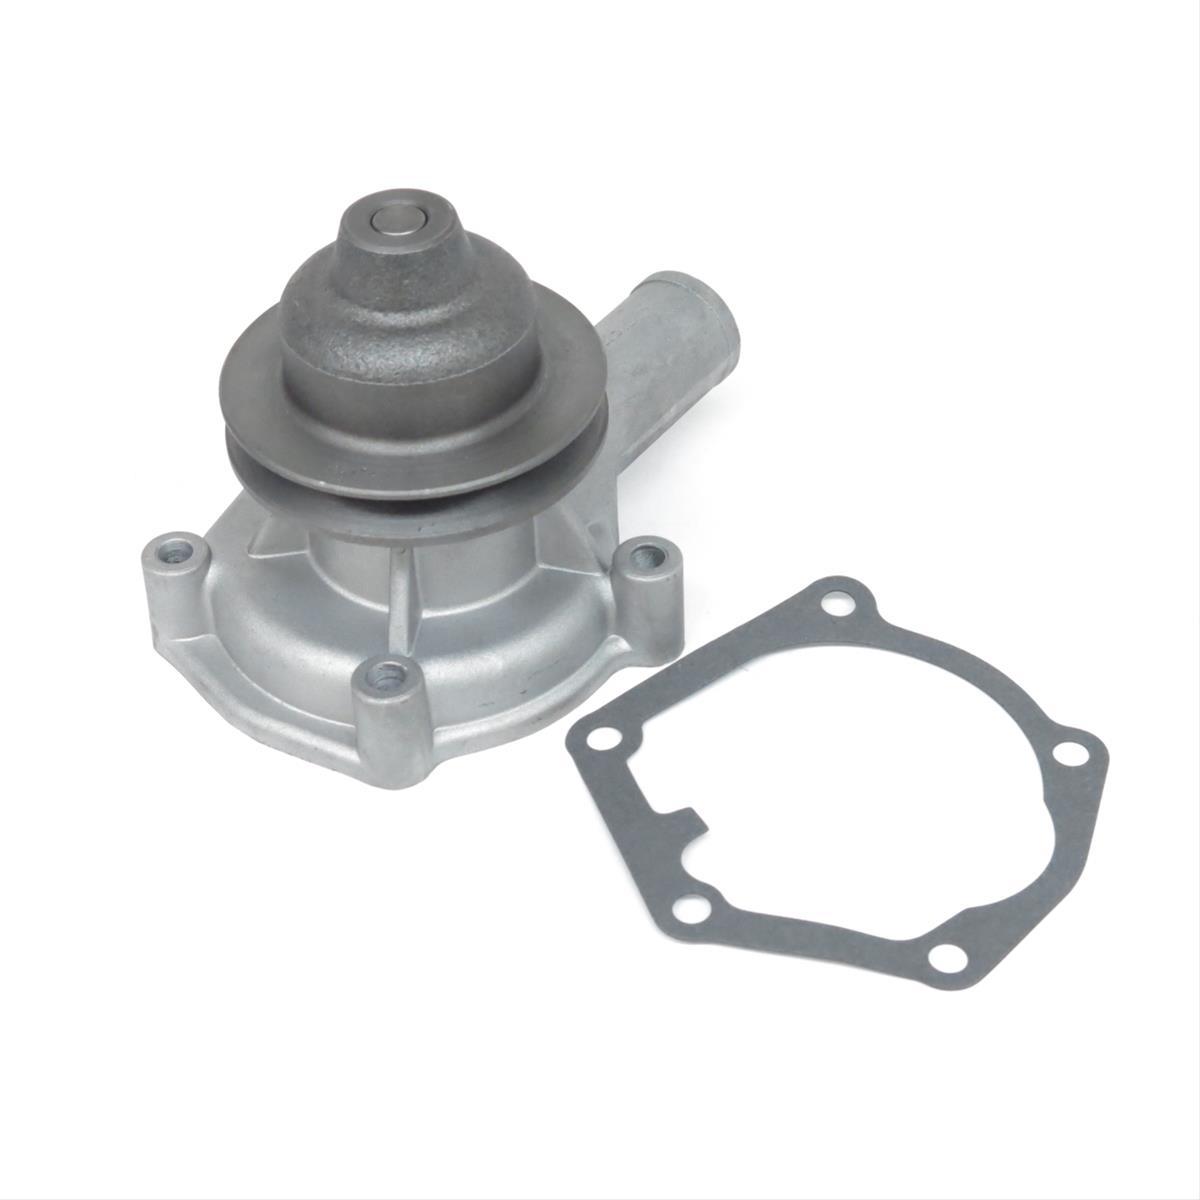 Water Pumps Motors thegymyarraville.com.au Aisin WPF-005 Engine ...